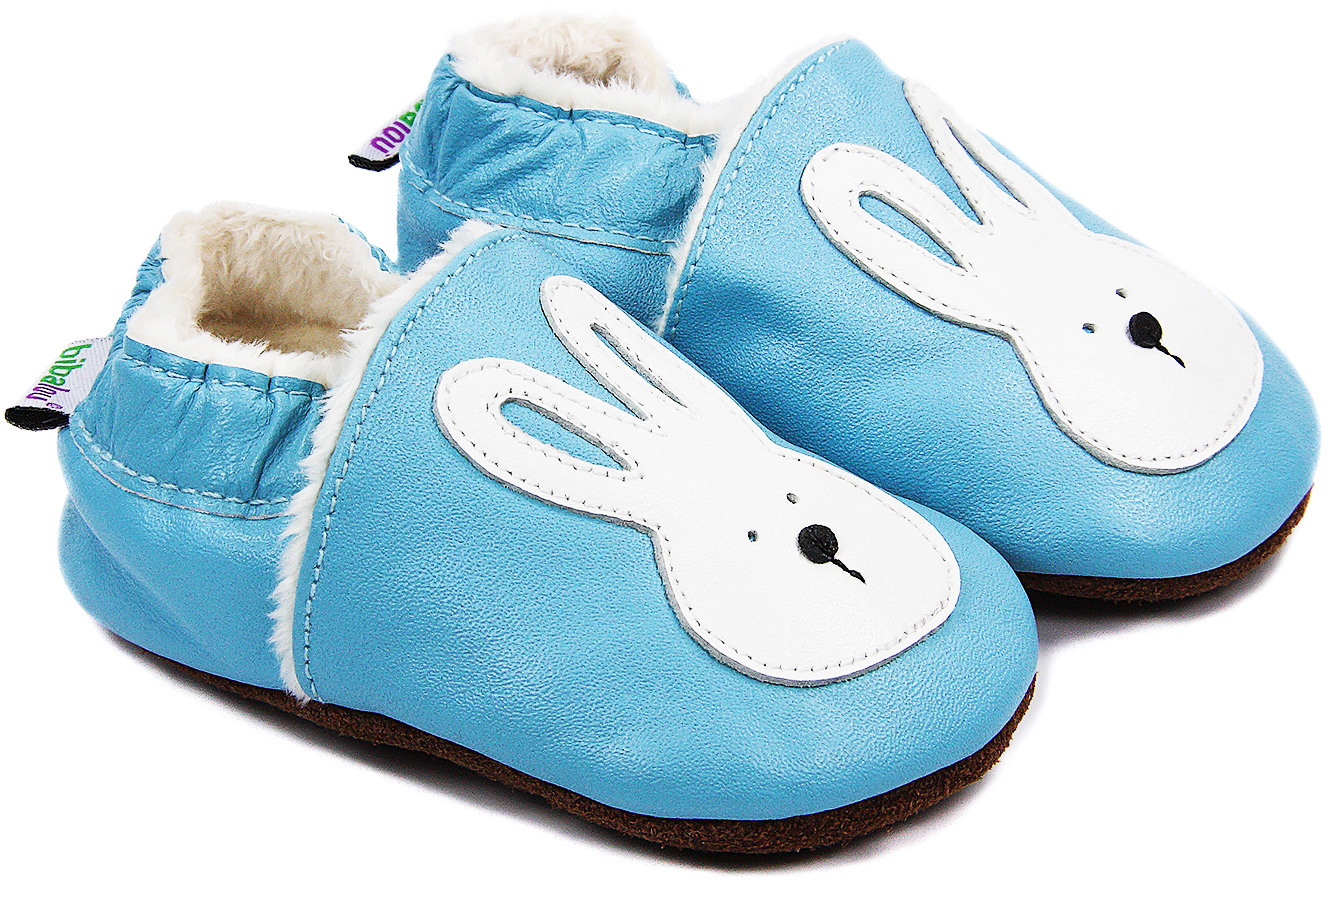 jeannot-le-lapin-bleu-face-900